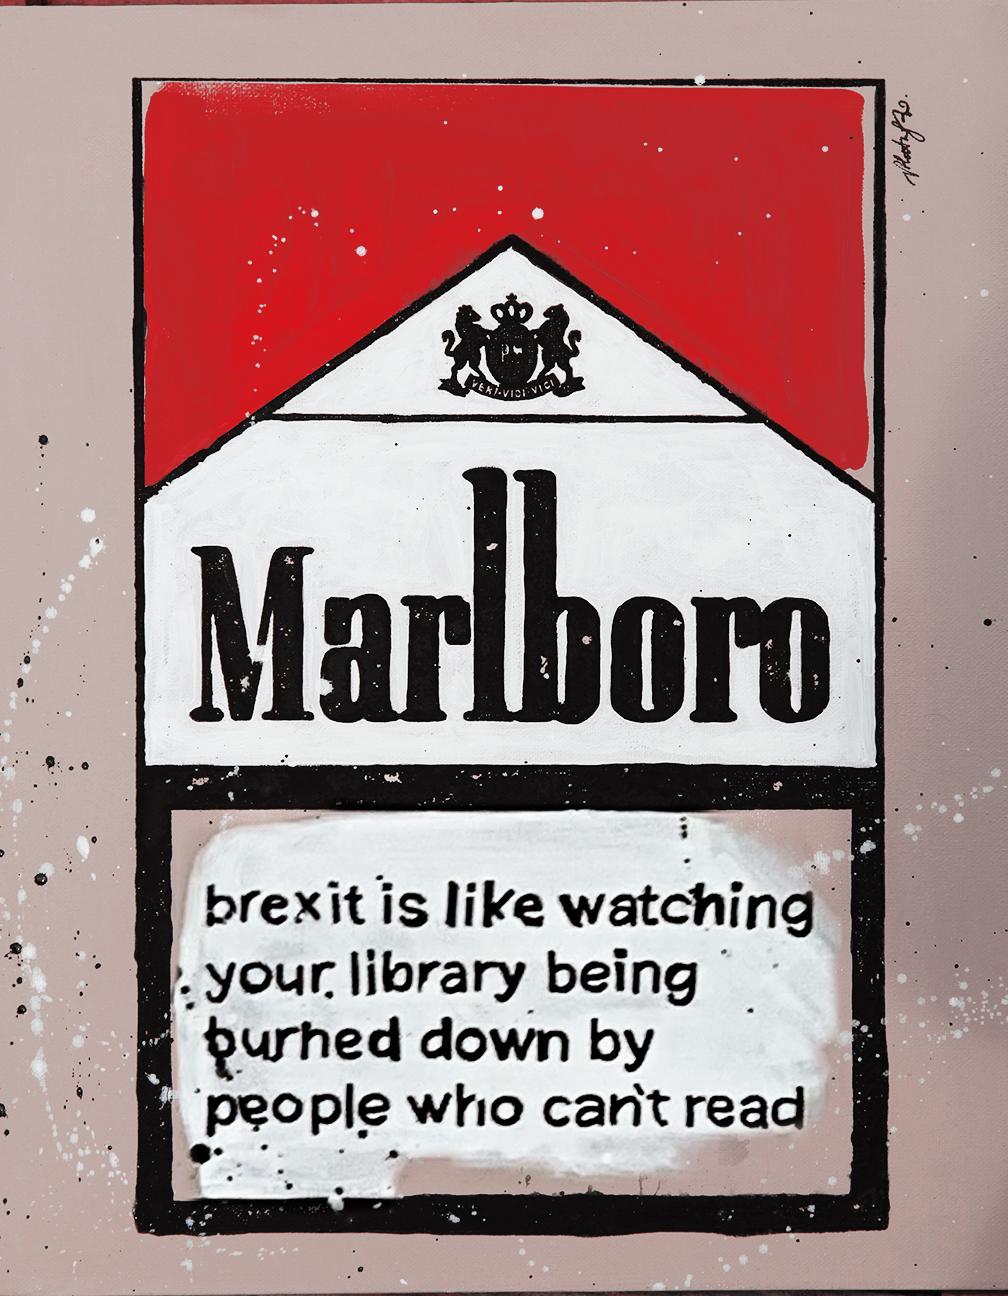 Marlboro_Brexit (2)